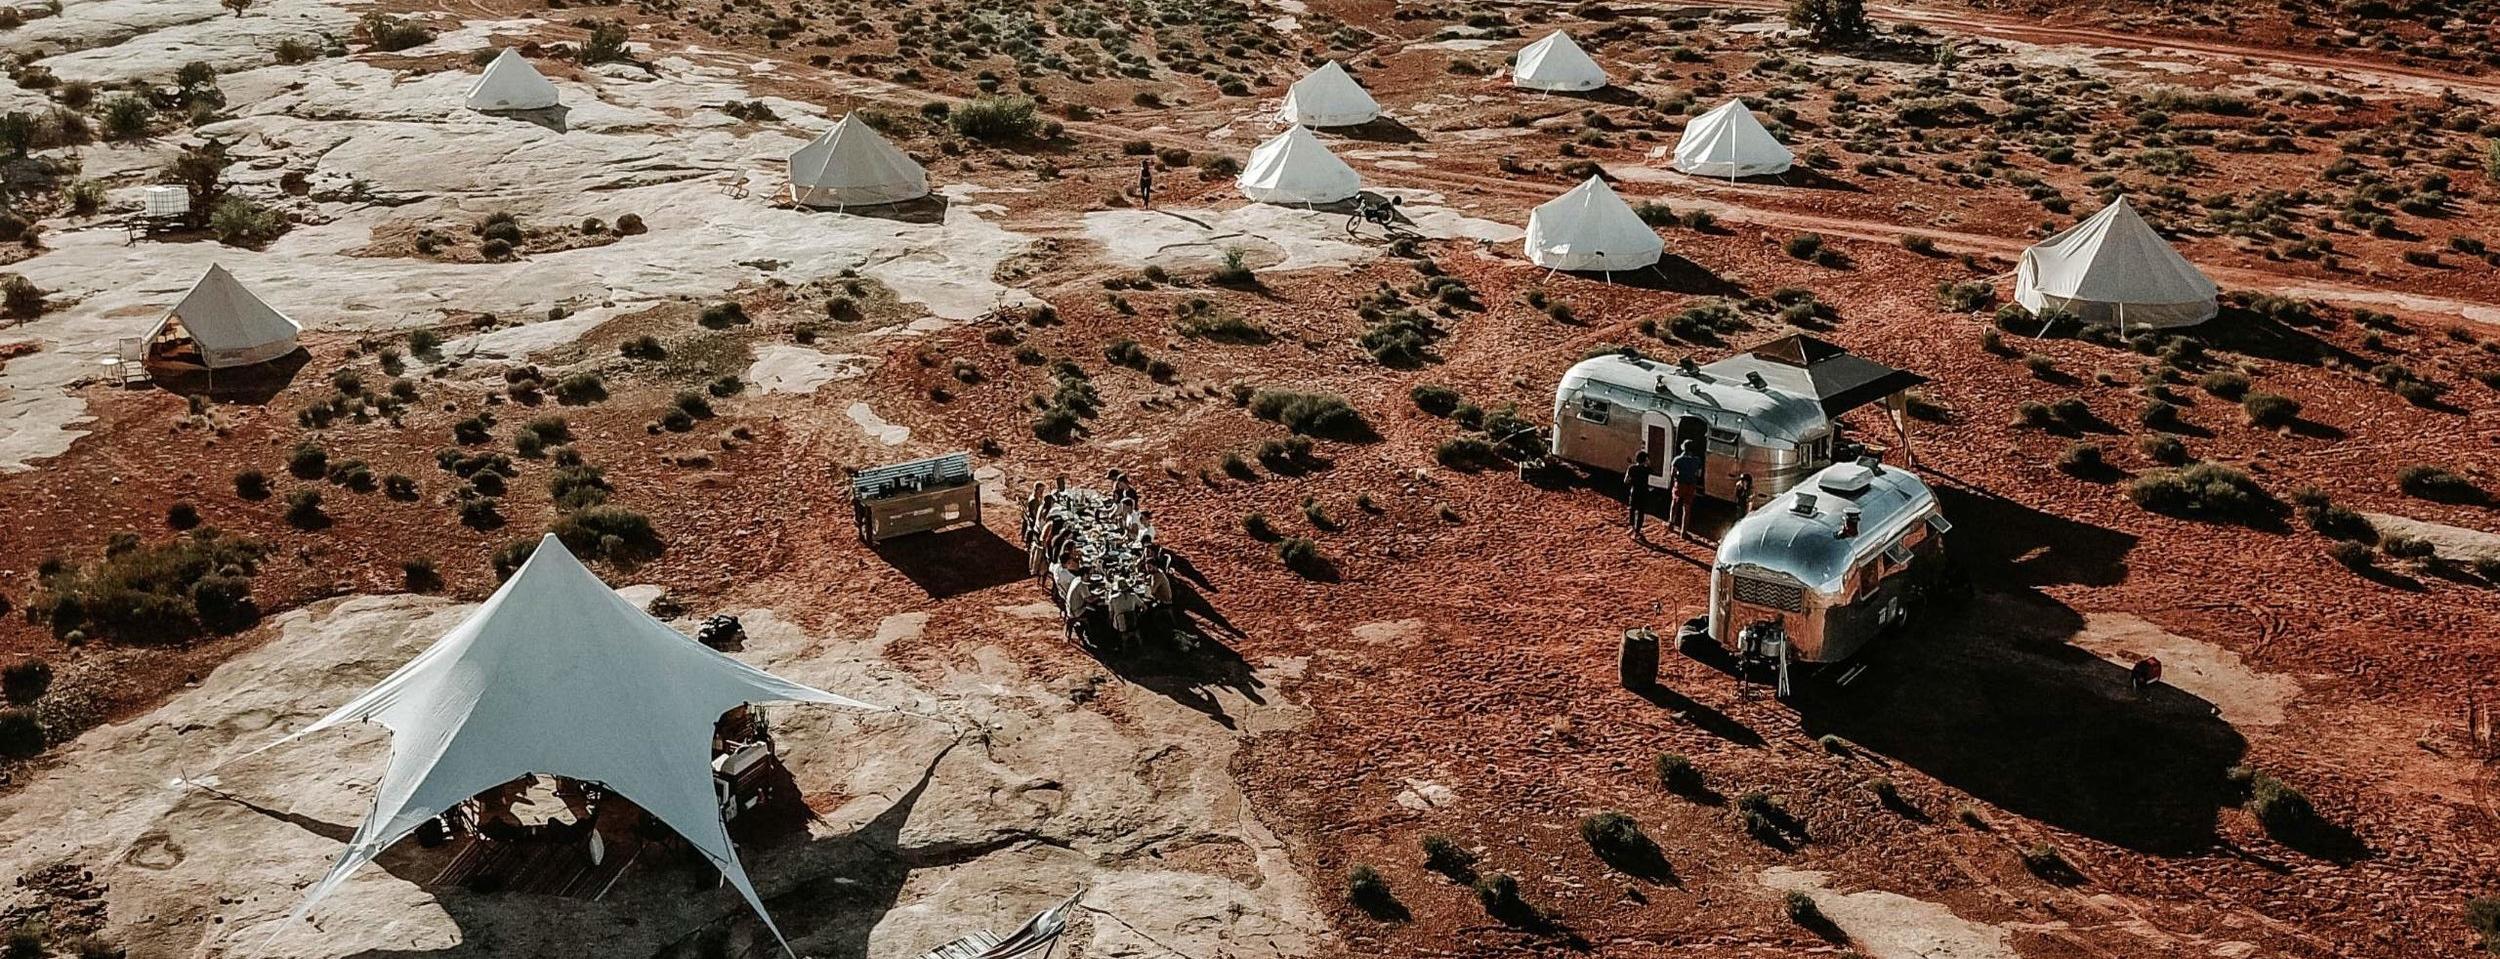 Camp+Wanderlost+Retreats